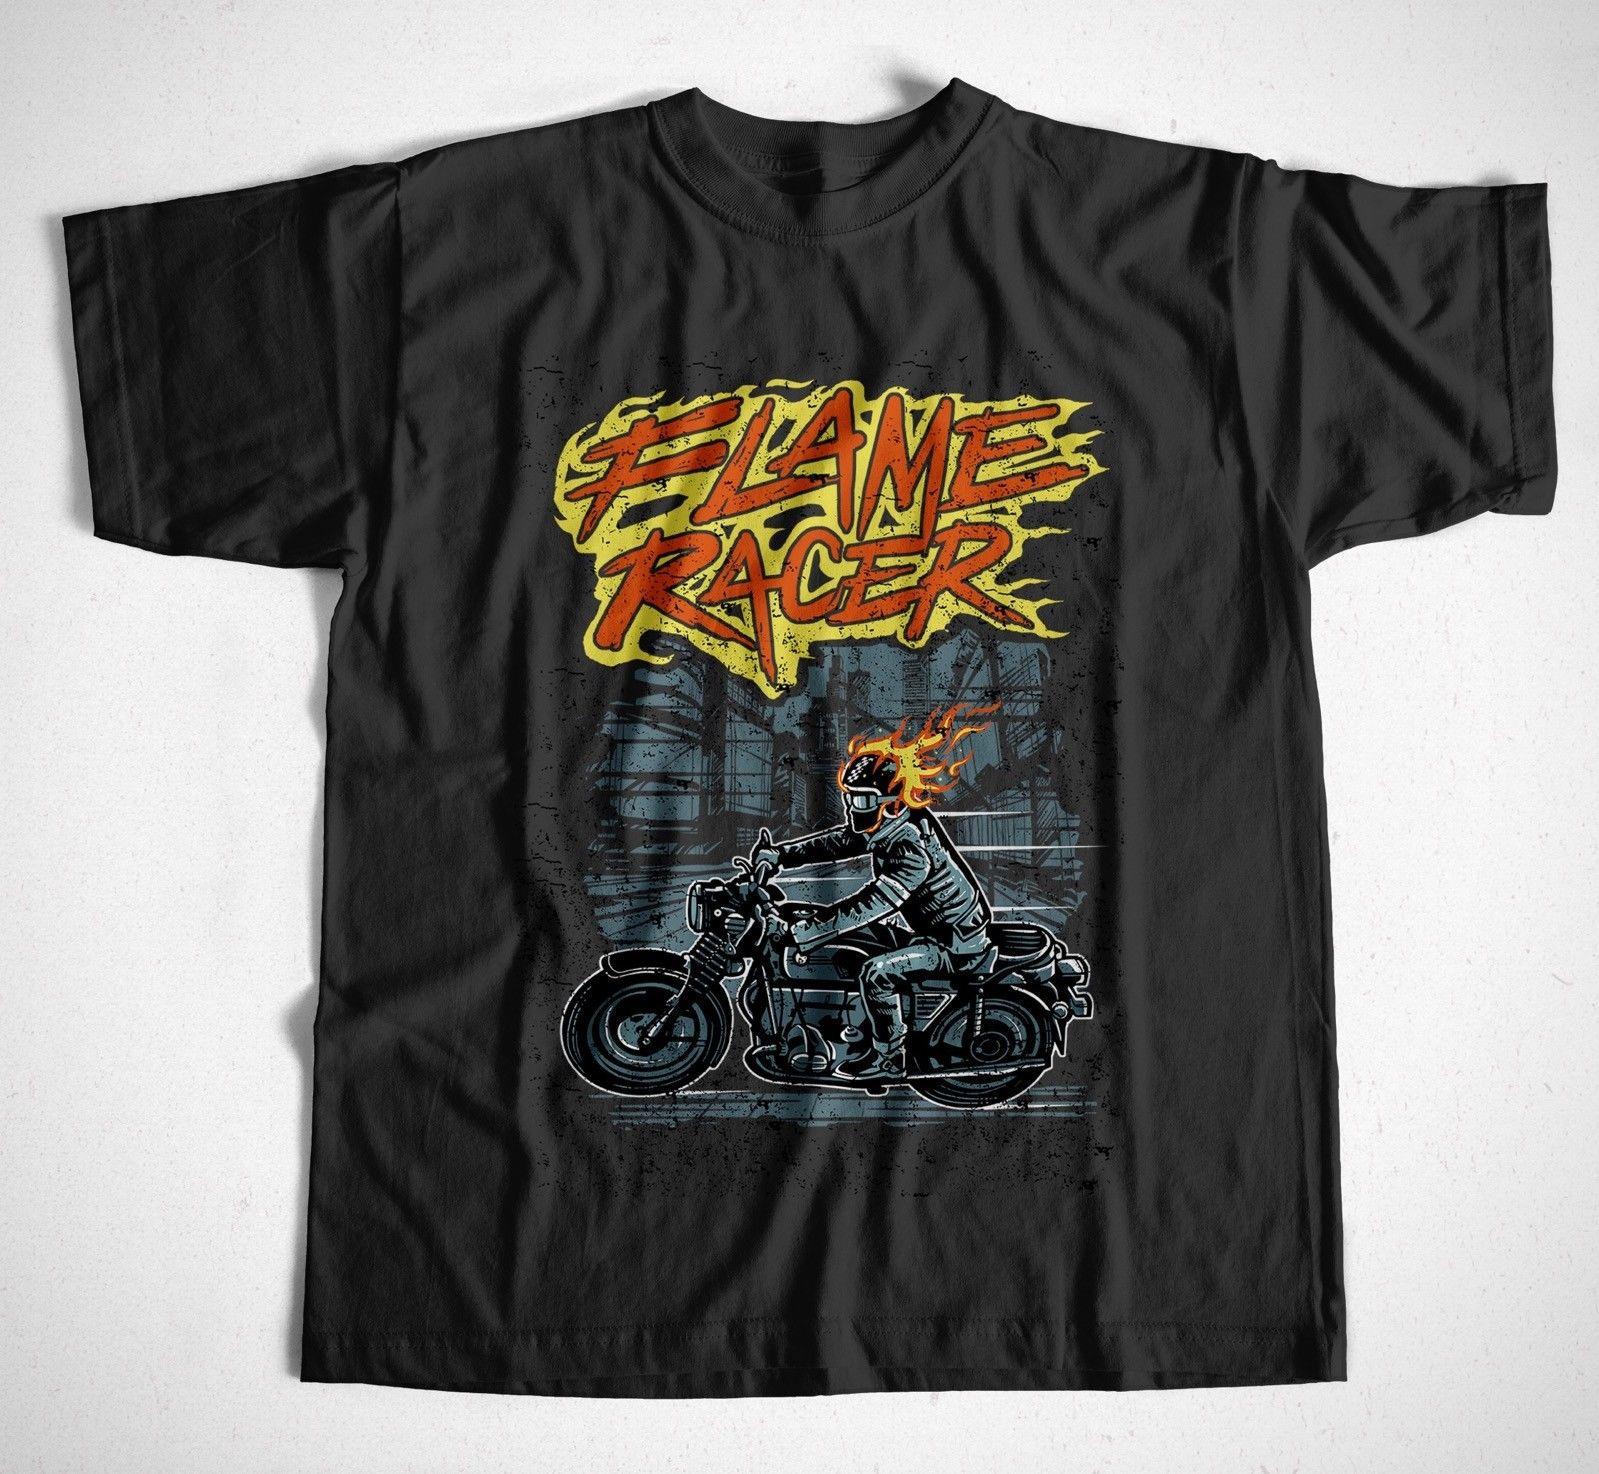 Flame Racer S 4Xl Biker Rocker Route 66 Hell Ghostrider Easy Rider